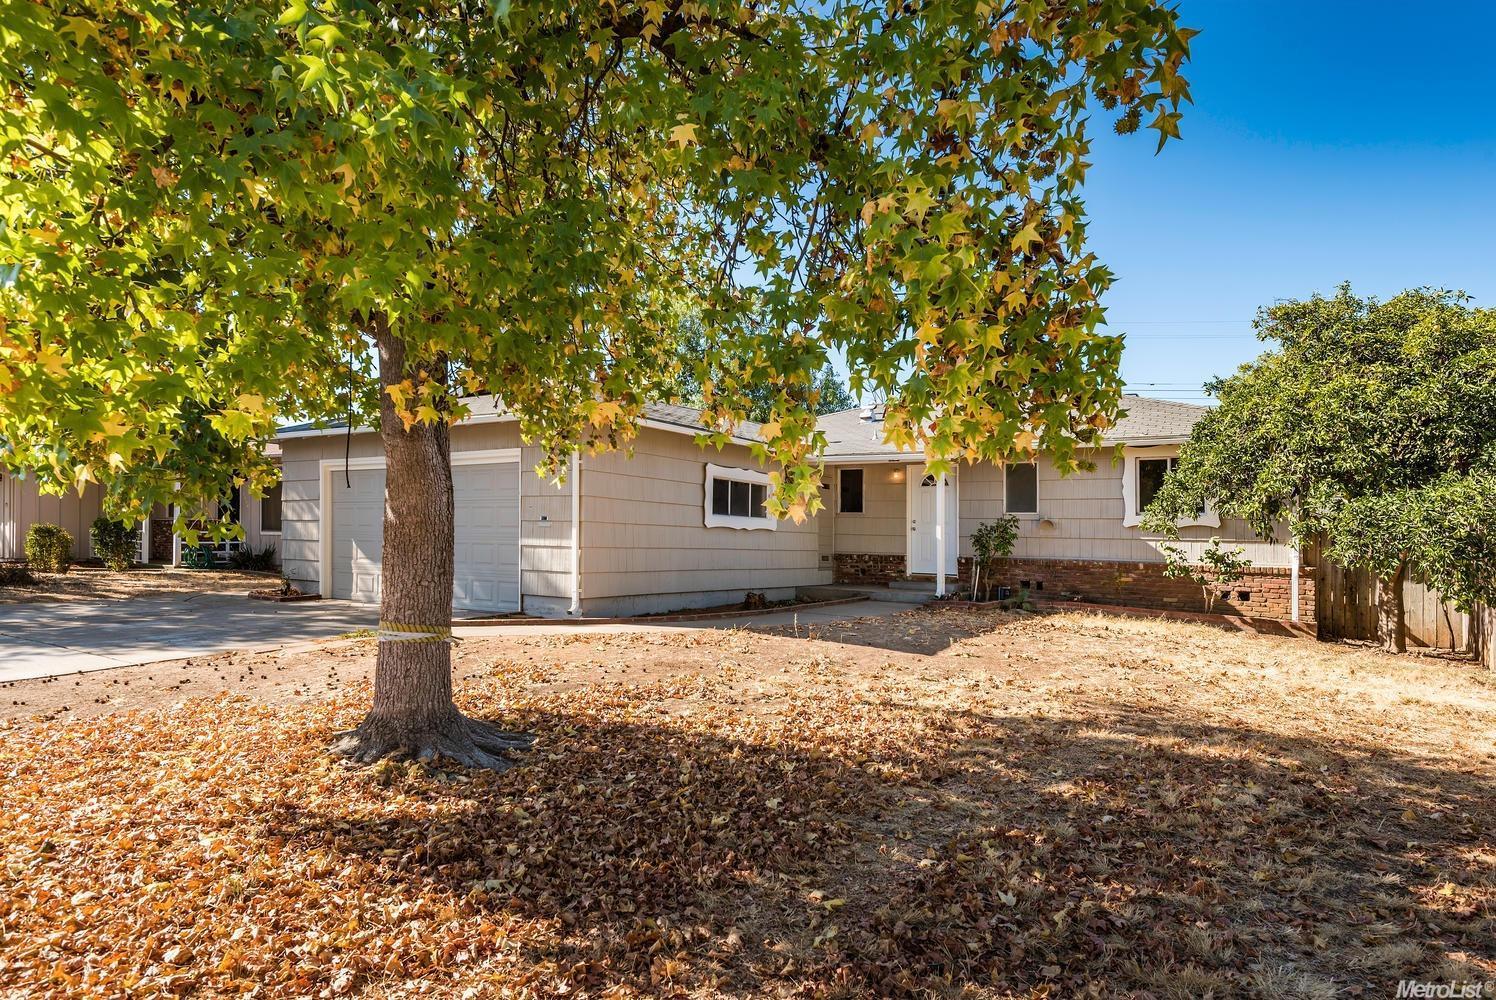 2530 Augibi Way, Rancho Cordova, CA 95670